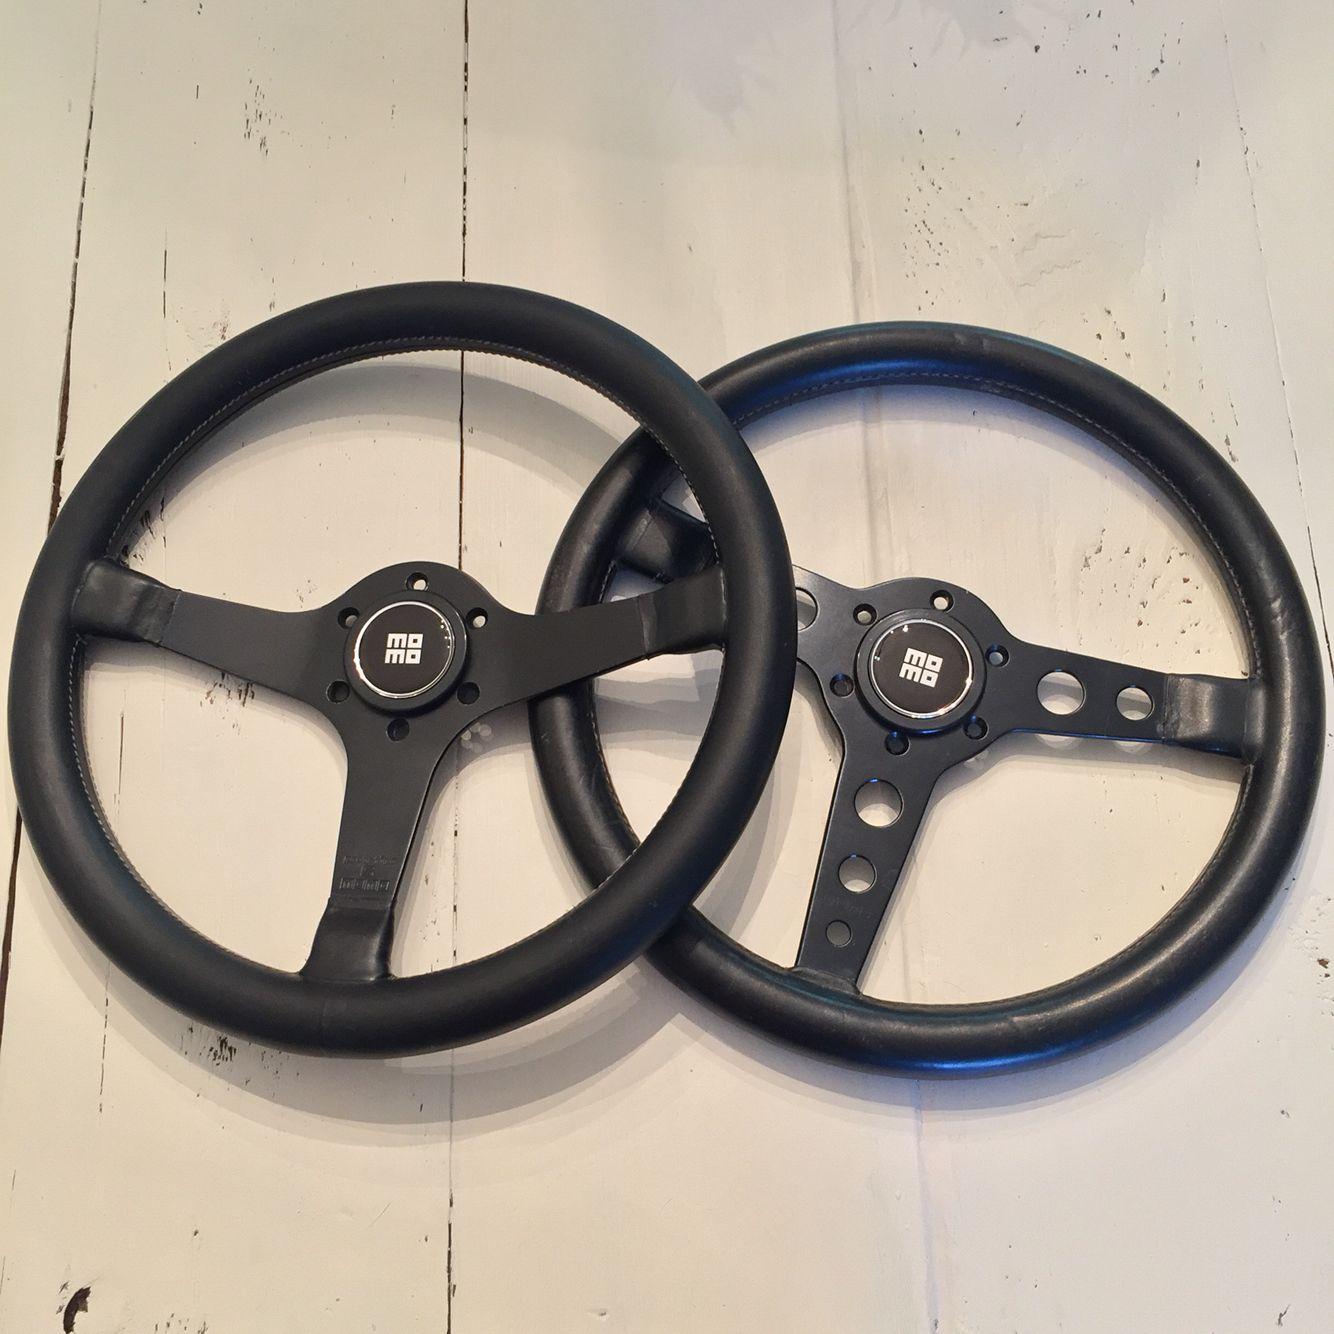 1211f408027b1a Momo prototipo S and flat Momo prototipo steering wheels   Cars ...